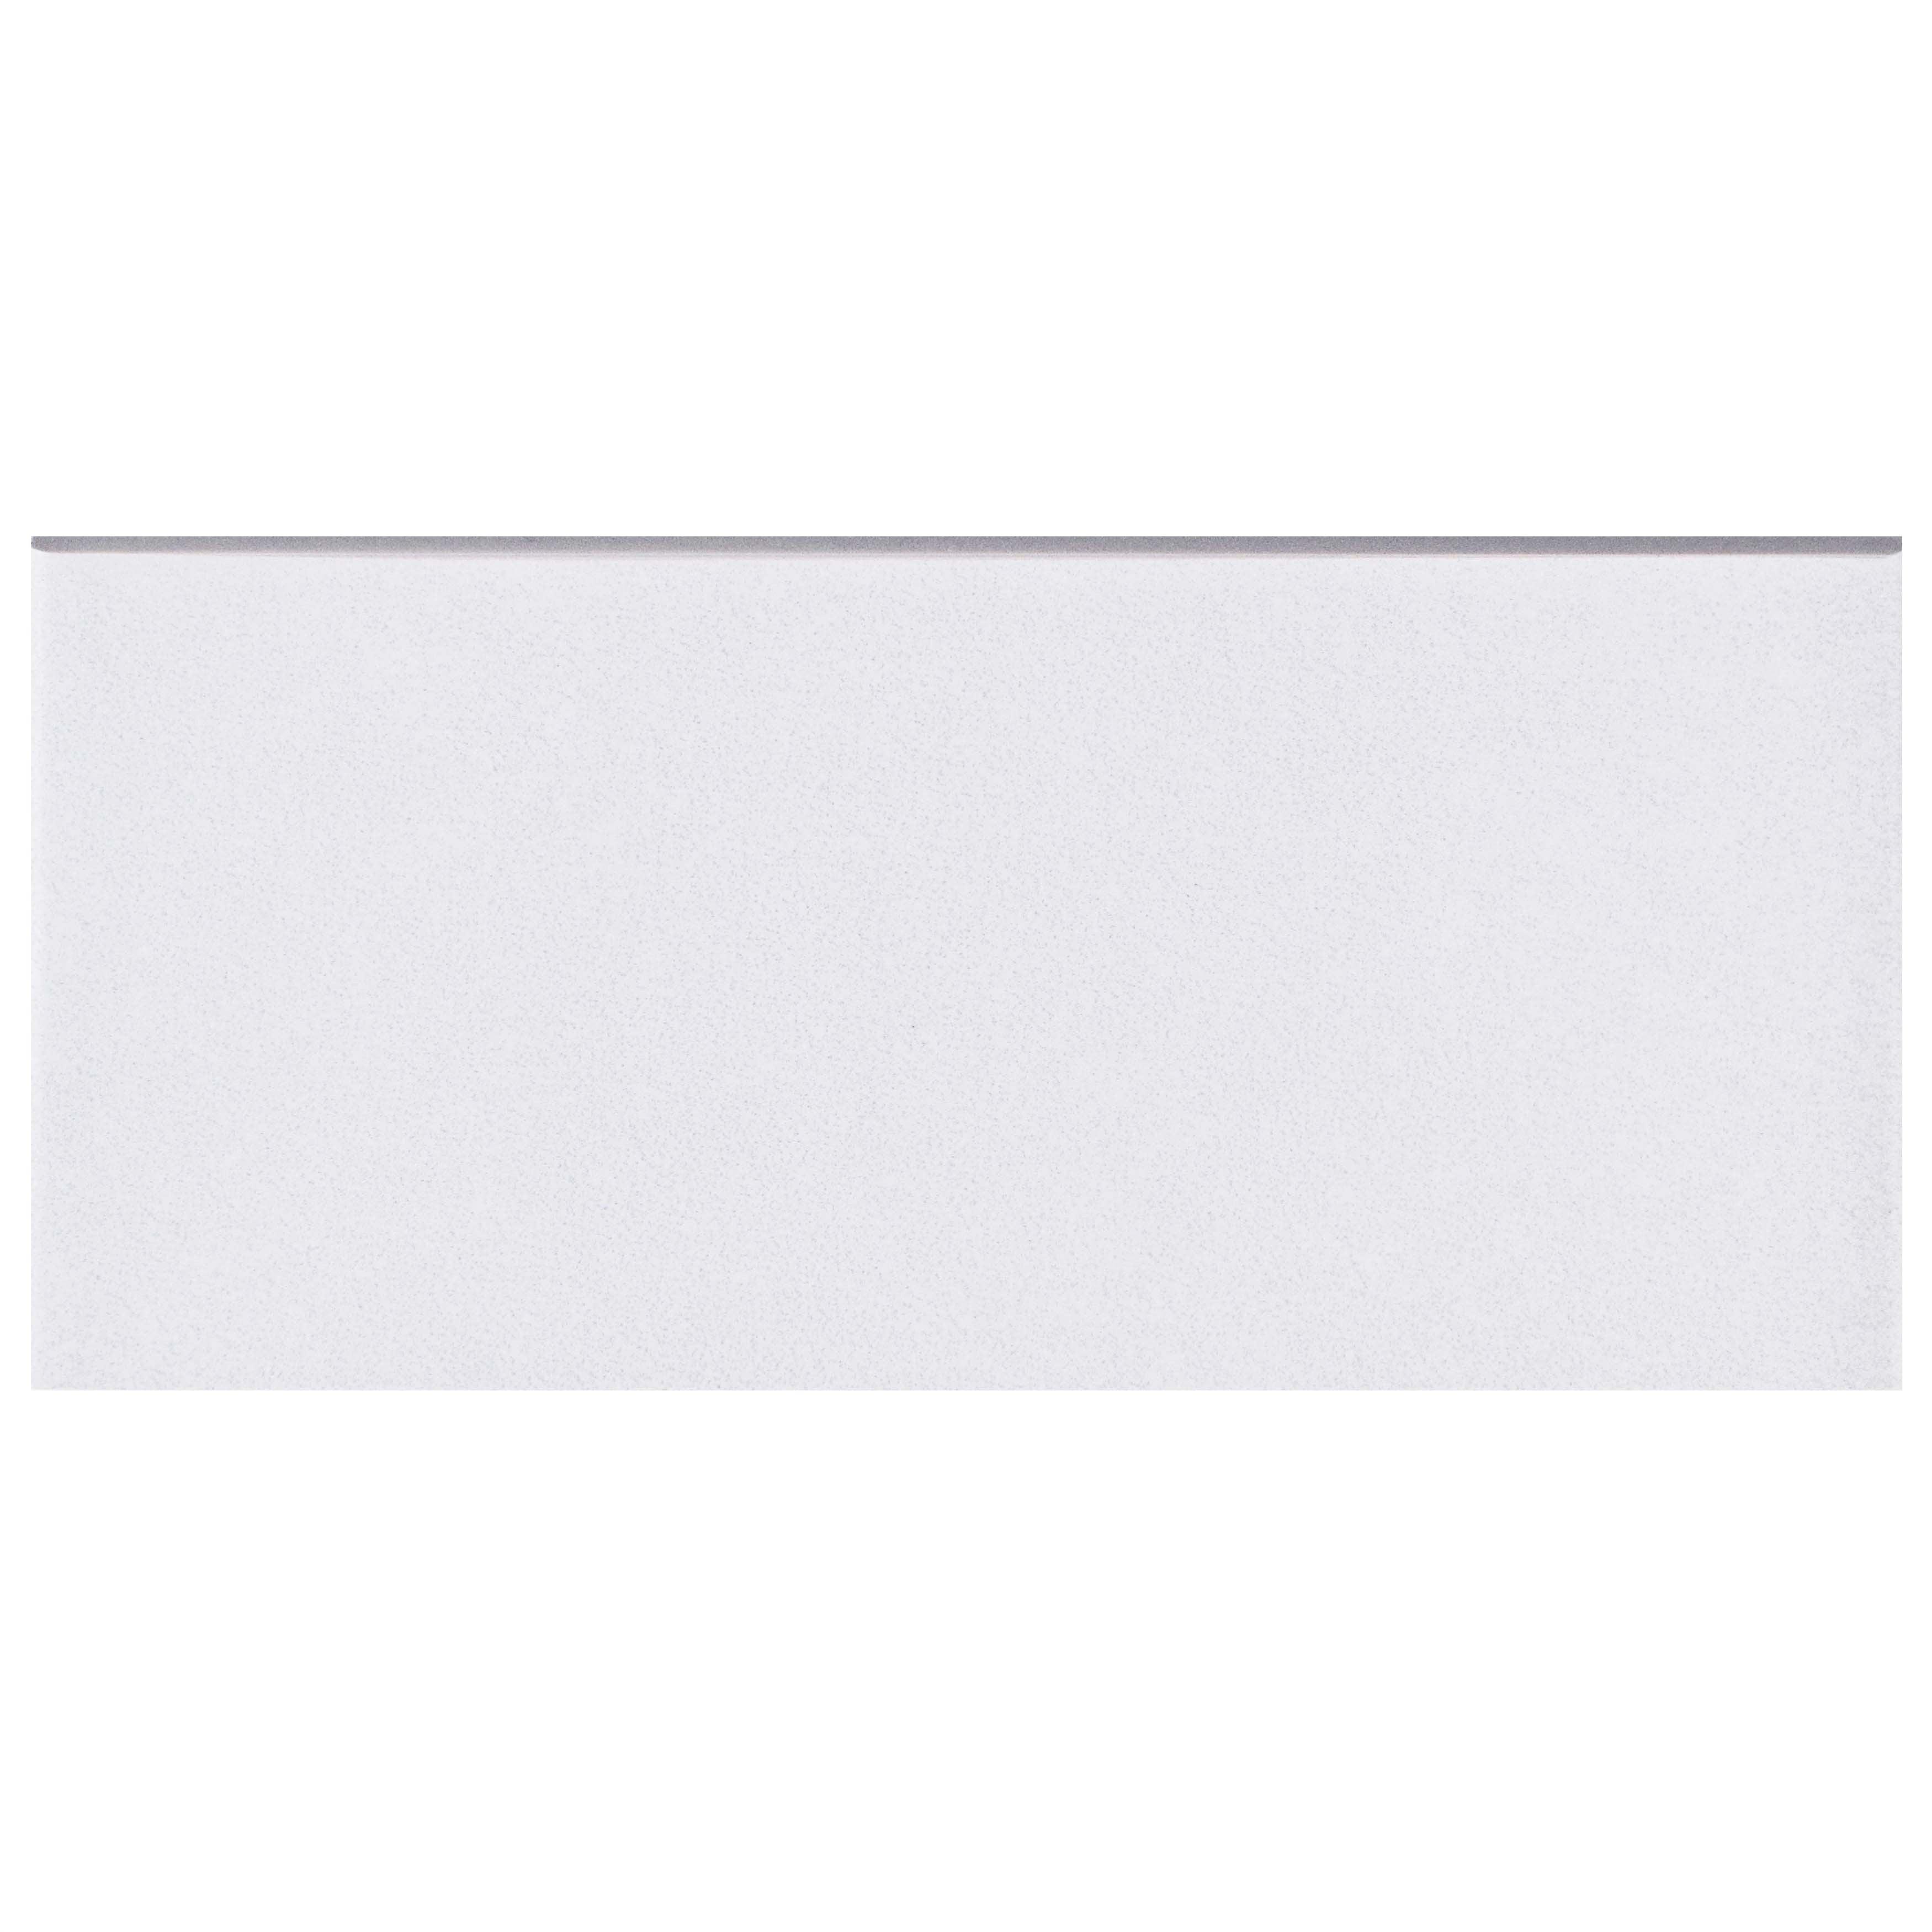 Shop SomerTile 3.5x7.75-inch Thirties White Ceramic Bullnose Floor ...